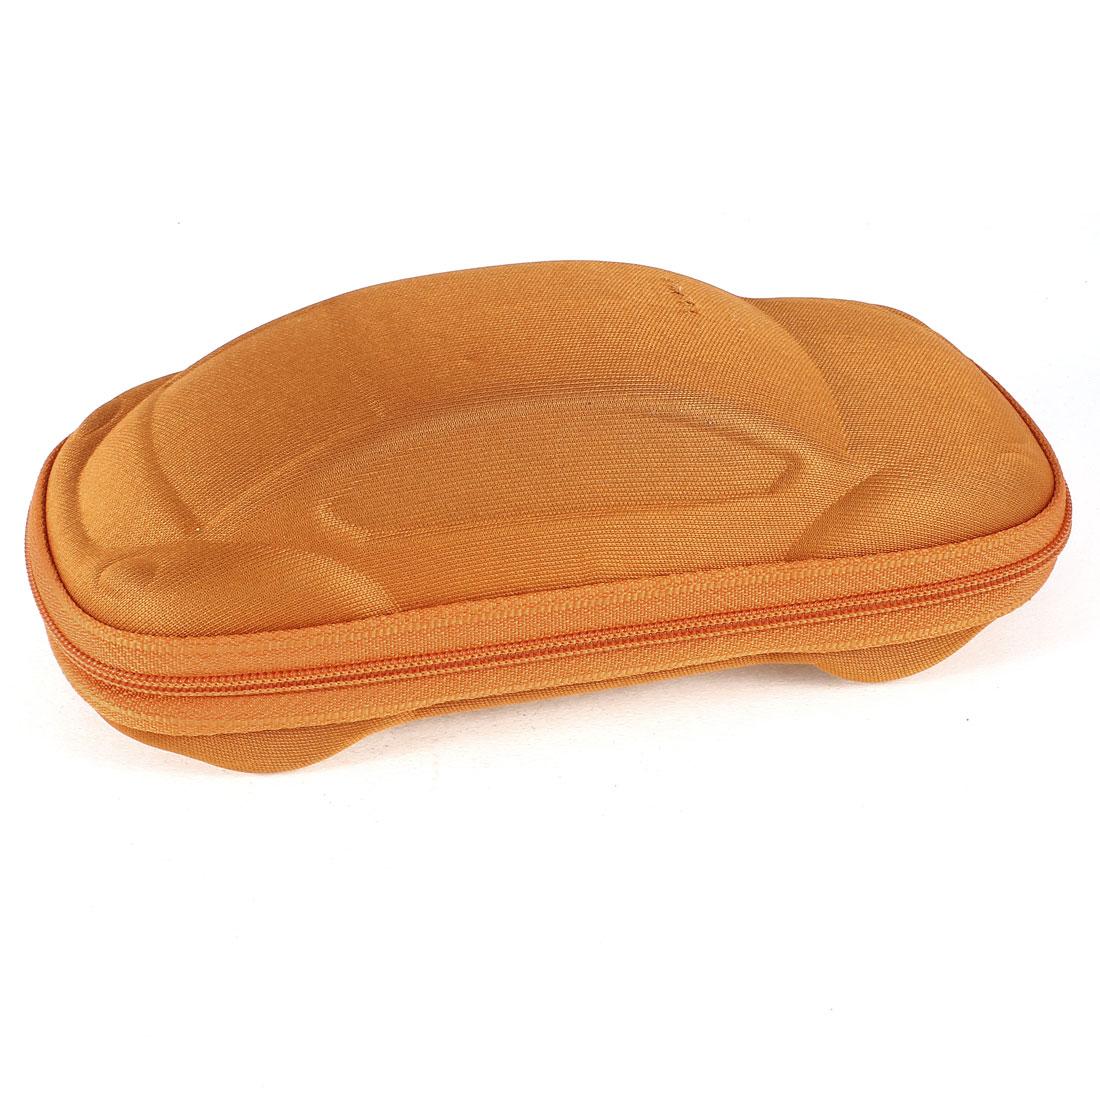 Orange Car Shaped Zippered Spectacles Plain Glasses Box Case